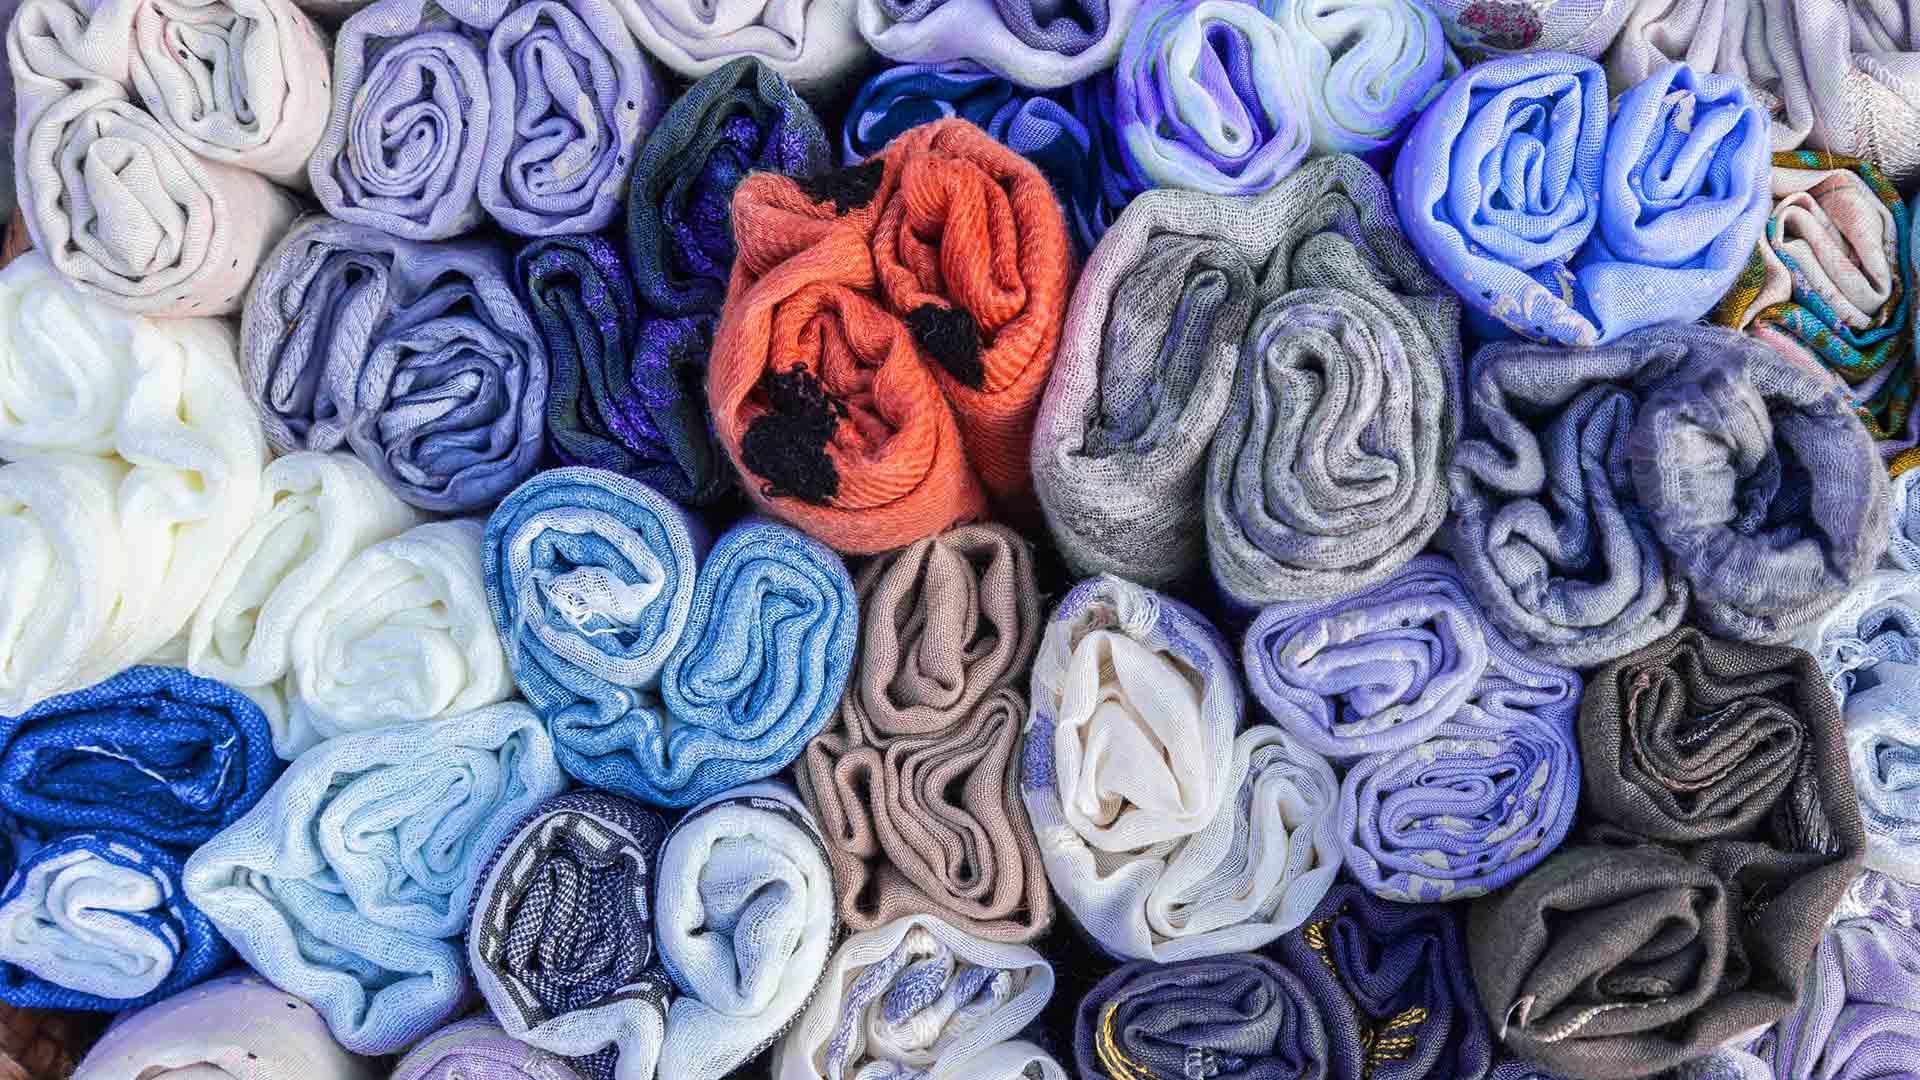 ER Near Me October offer scarf material closeup